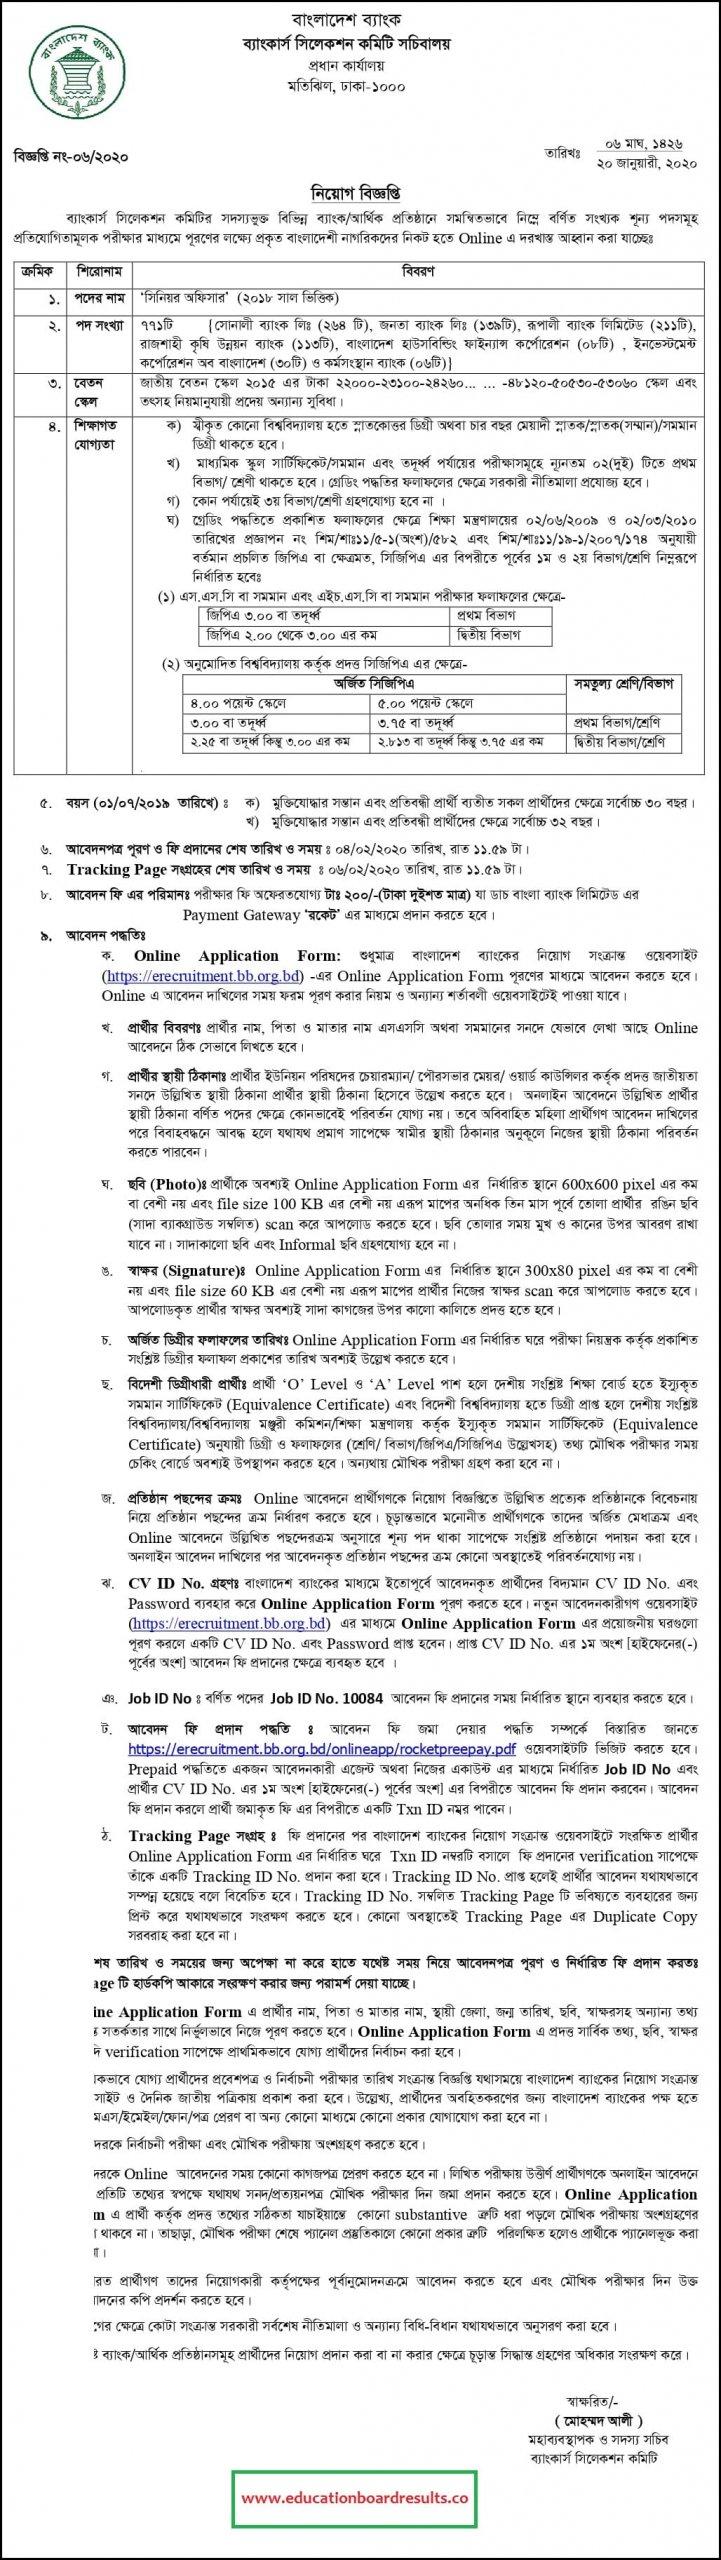 Bangladesh Bank Senior Officer Job Circular 2020